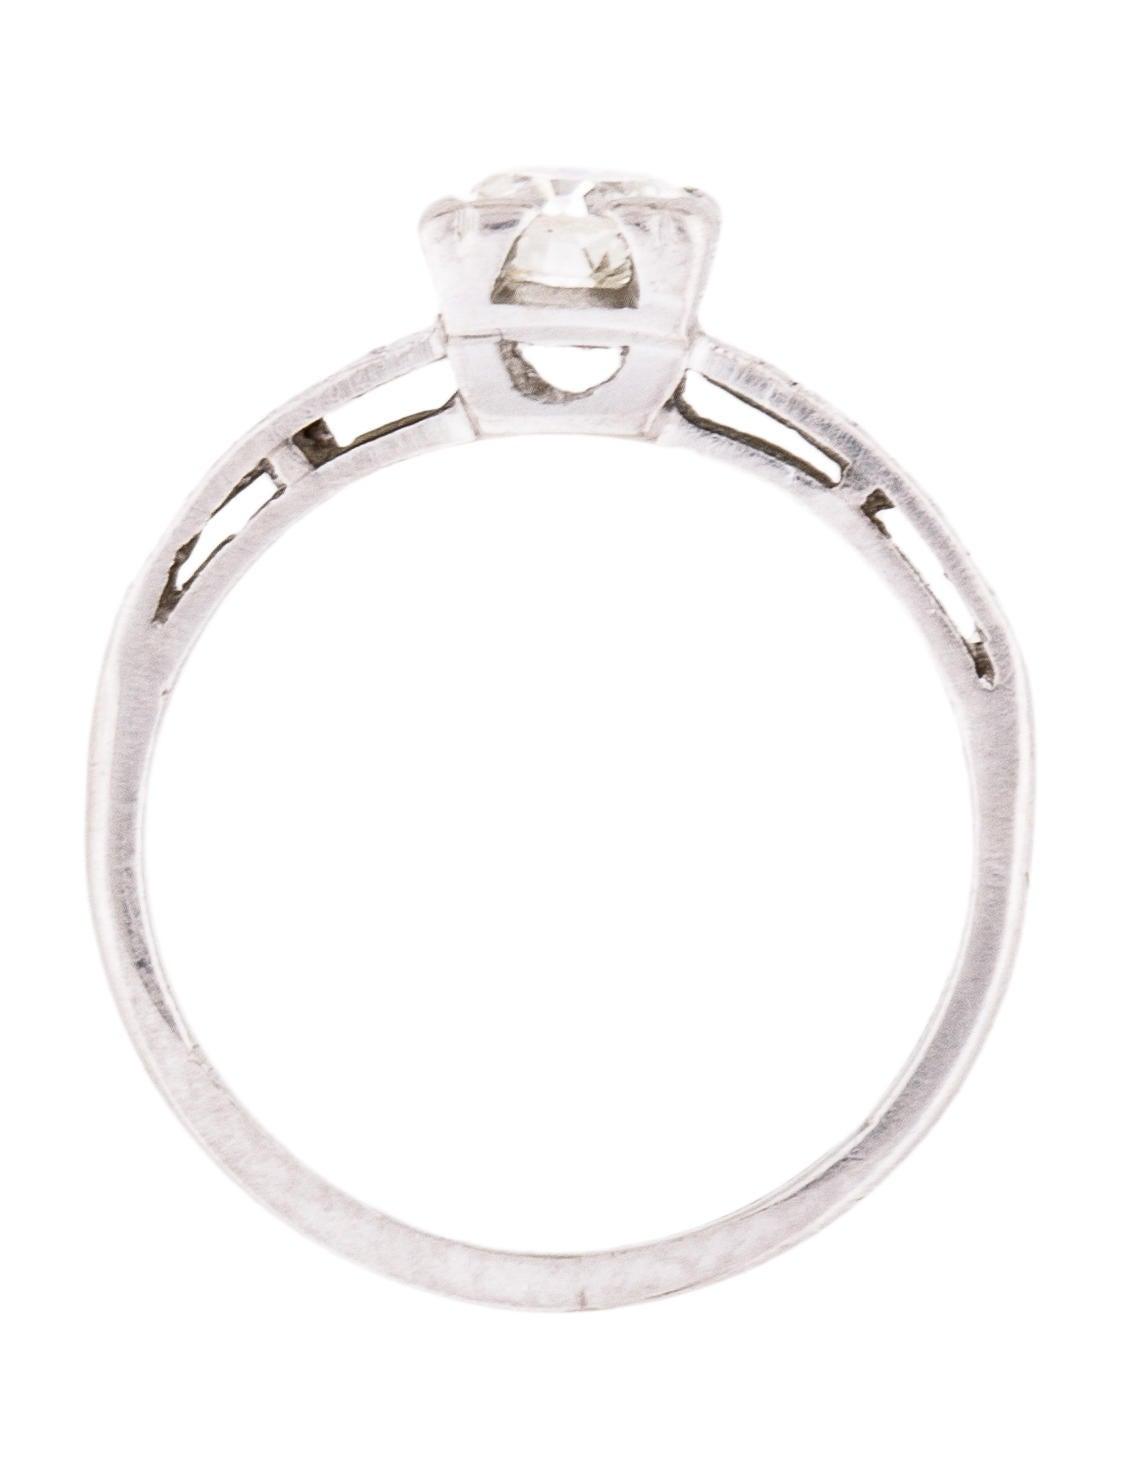 engagement ring vintage platinum diamond engagement ring rings engri20523 the realreal. Black Bedroom Furniture Sets. Home Design Ideas